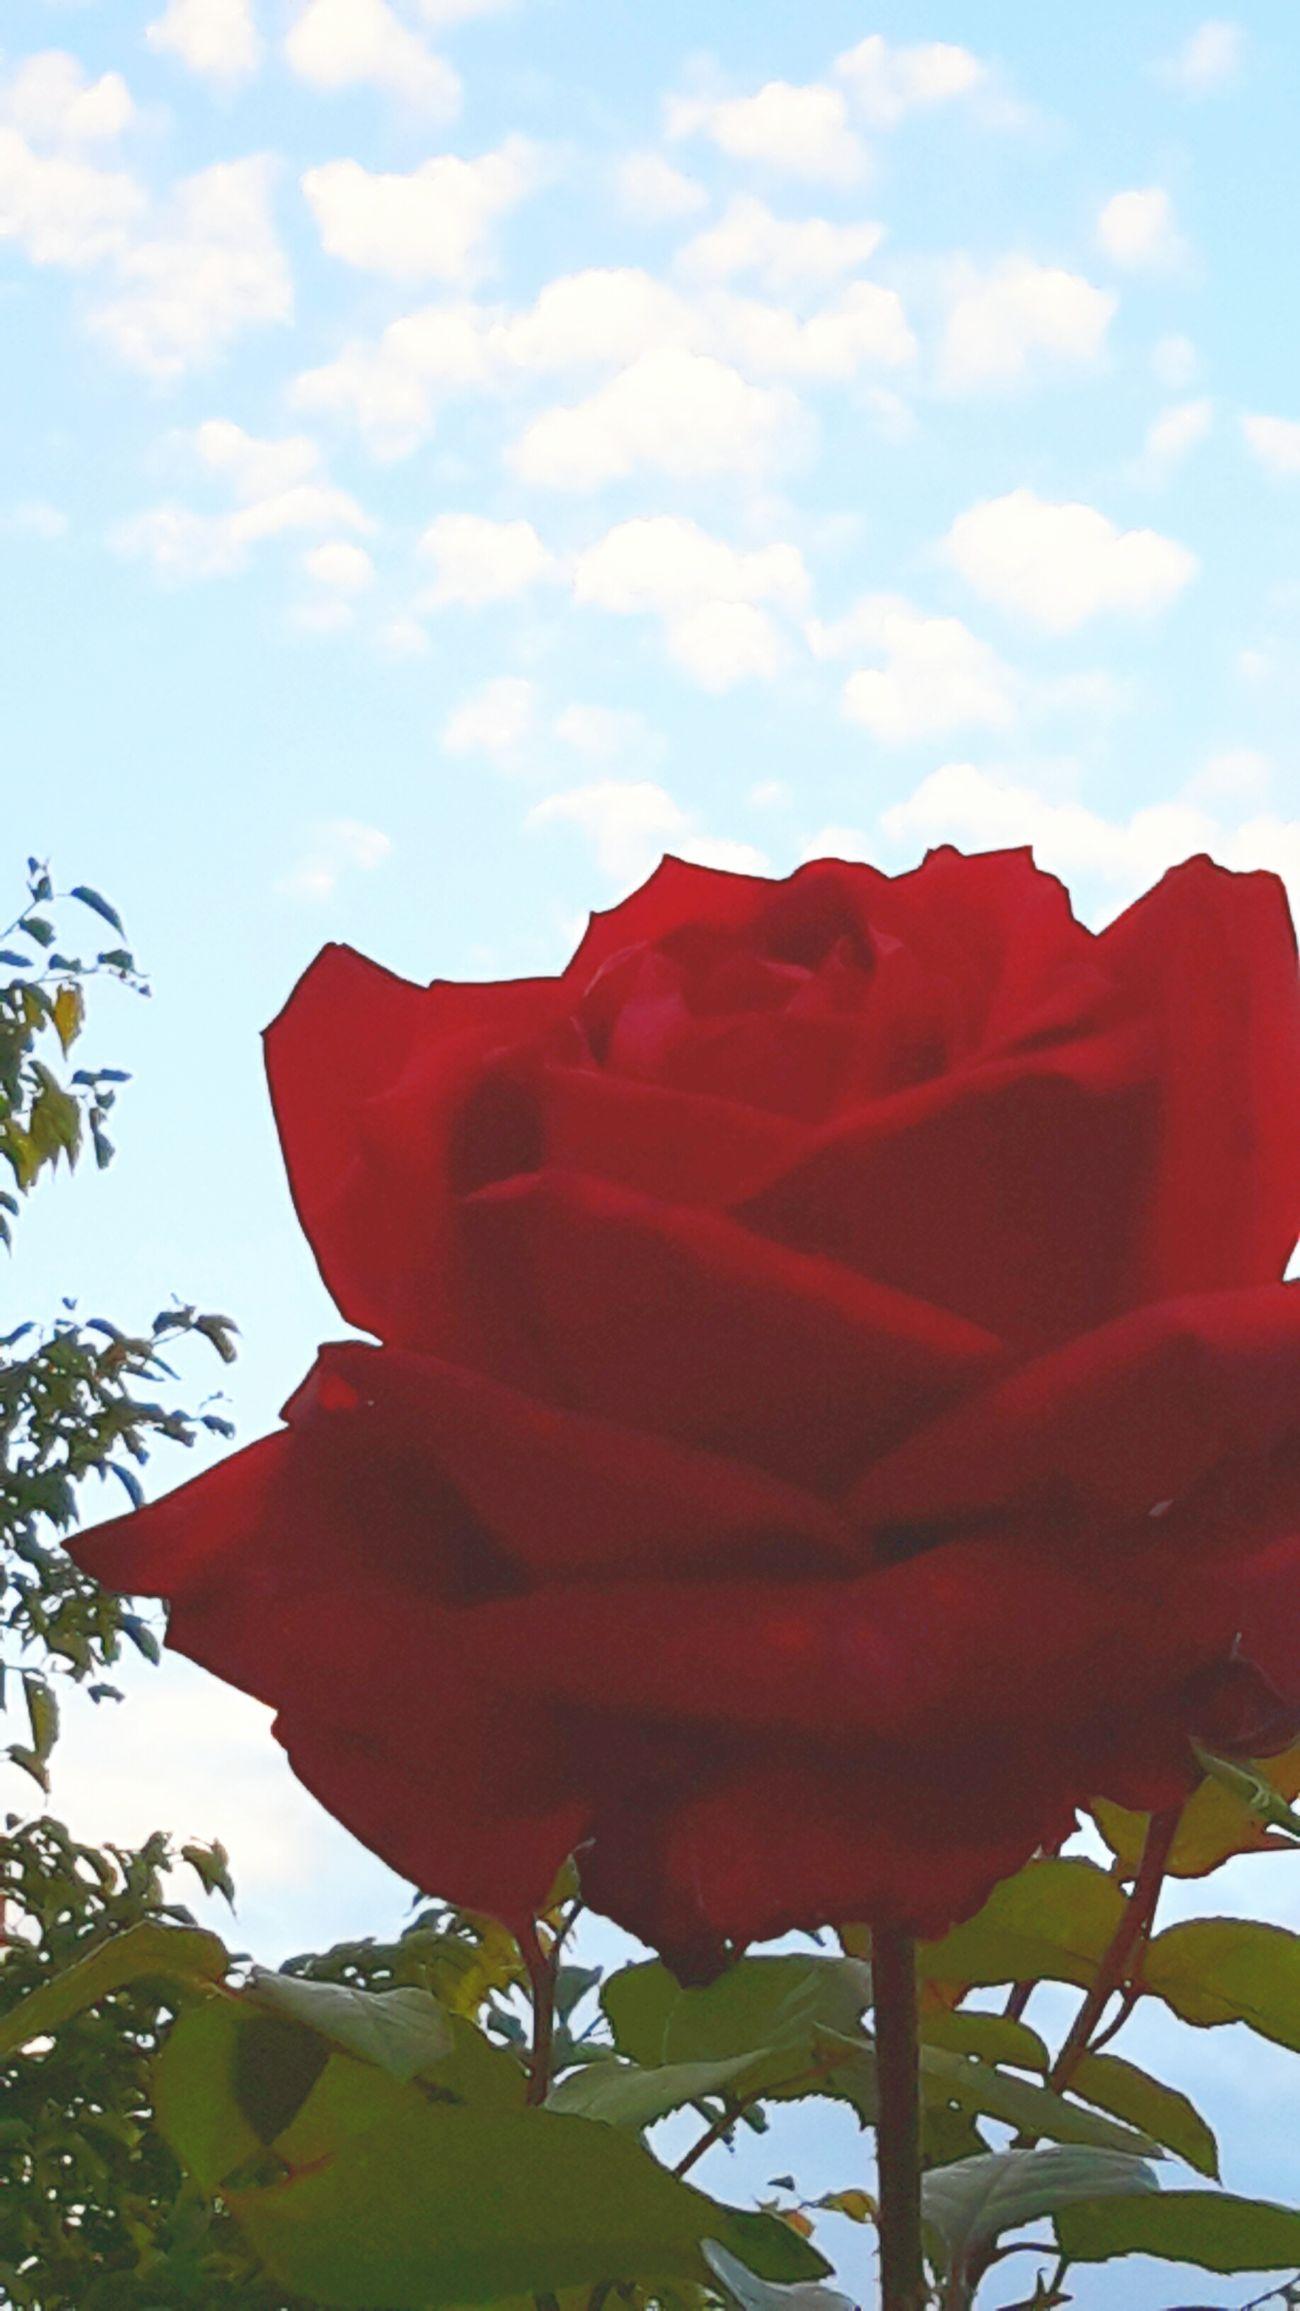 Flowers In My Garden Redandblue Rose🌹 Flowers,Plants & Garden Beautiful Nature Garden Petals Flower Photography Petals By Nature Contrast Flower Head Nature Beauty Beauty In Nature